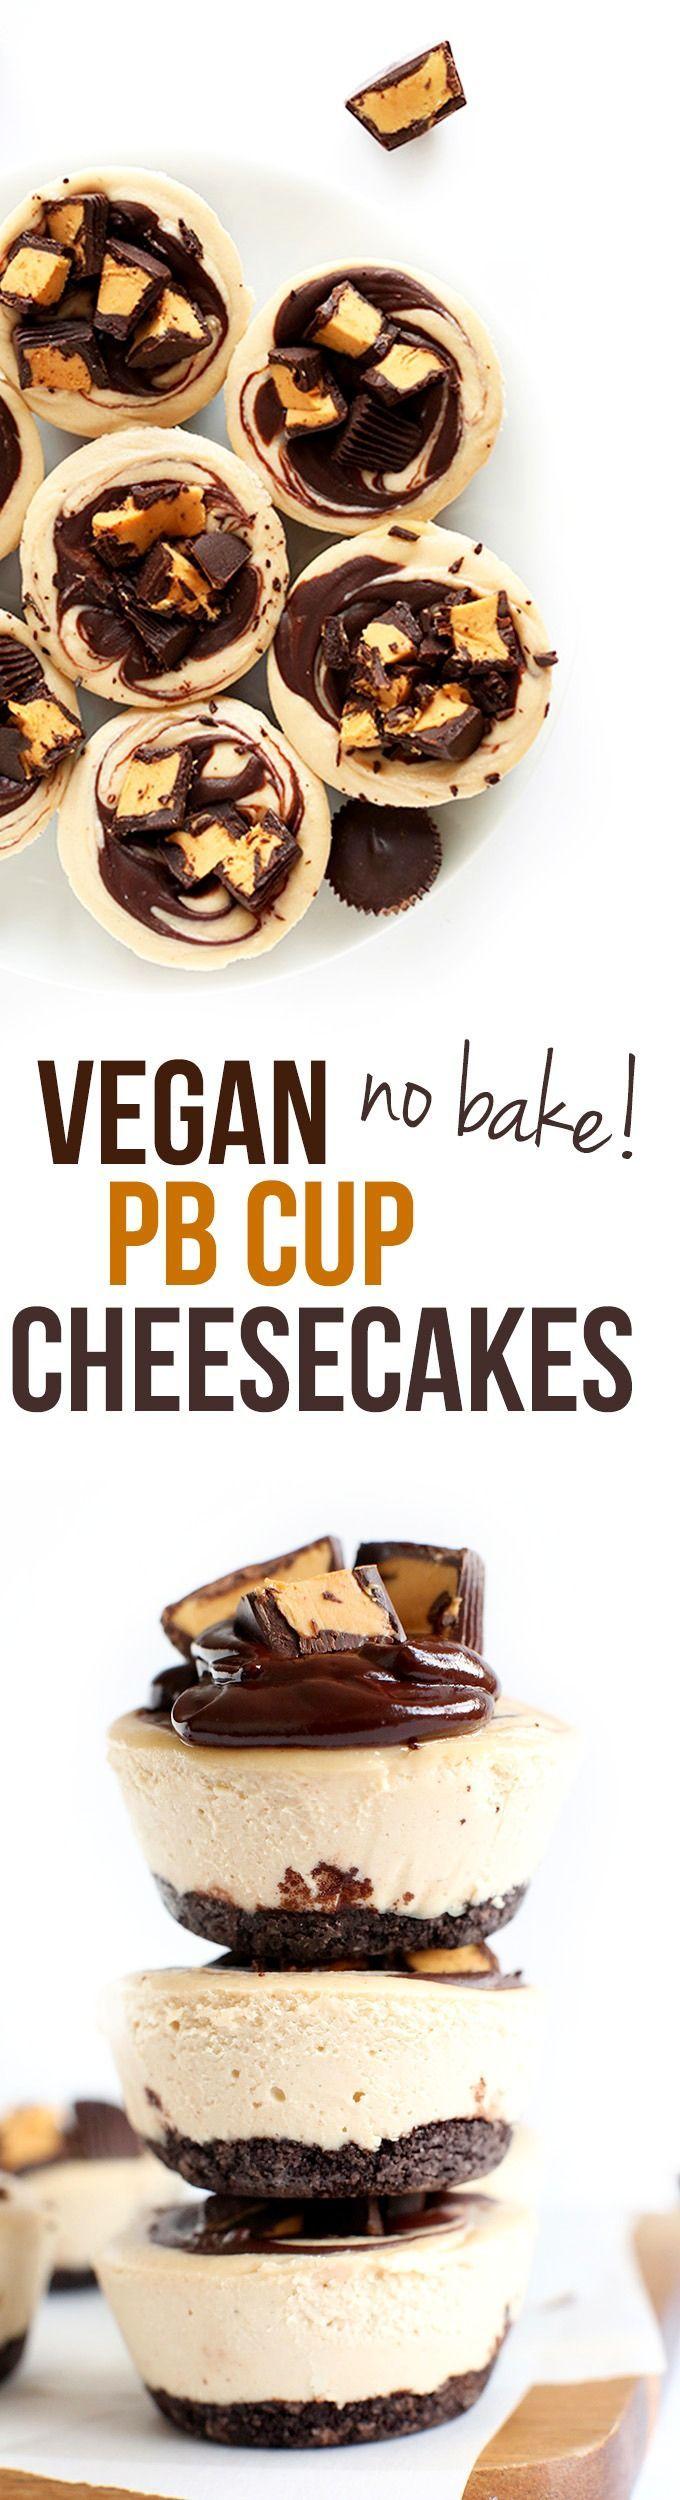 9 ingredients, #vegan and SO delicious!